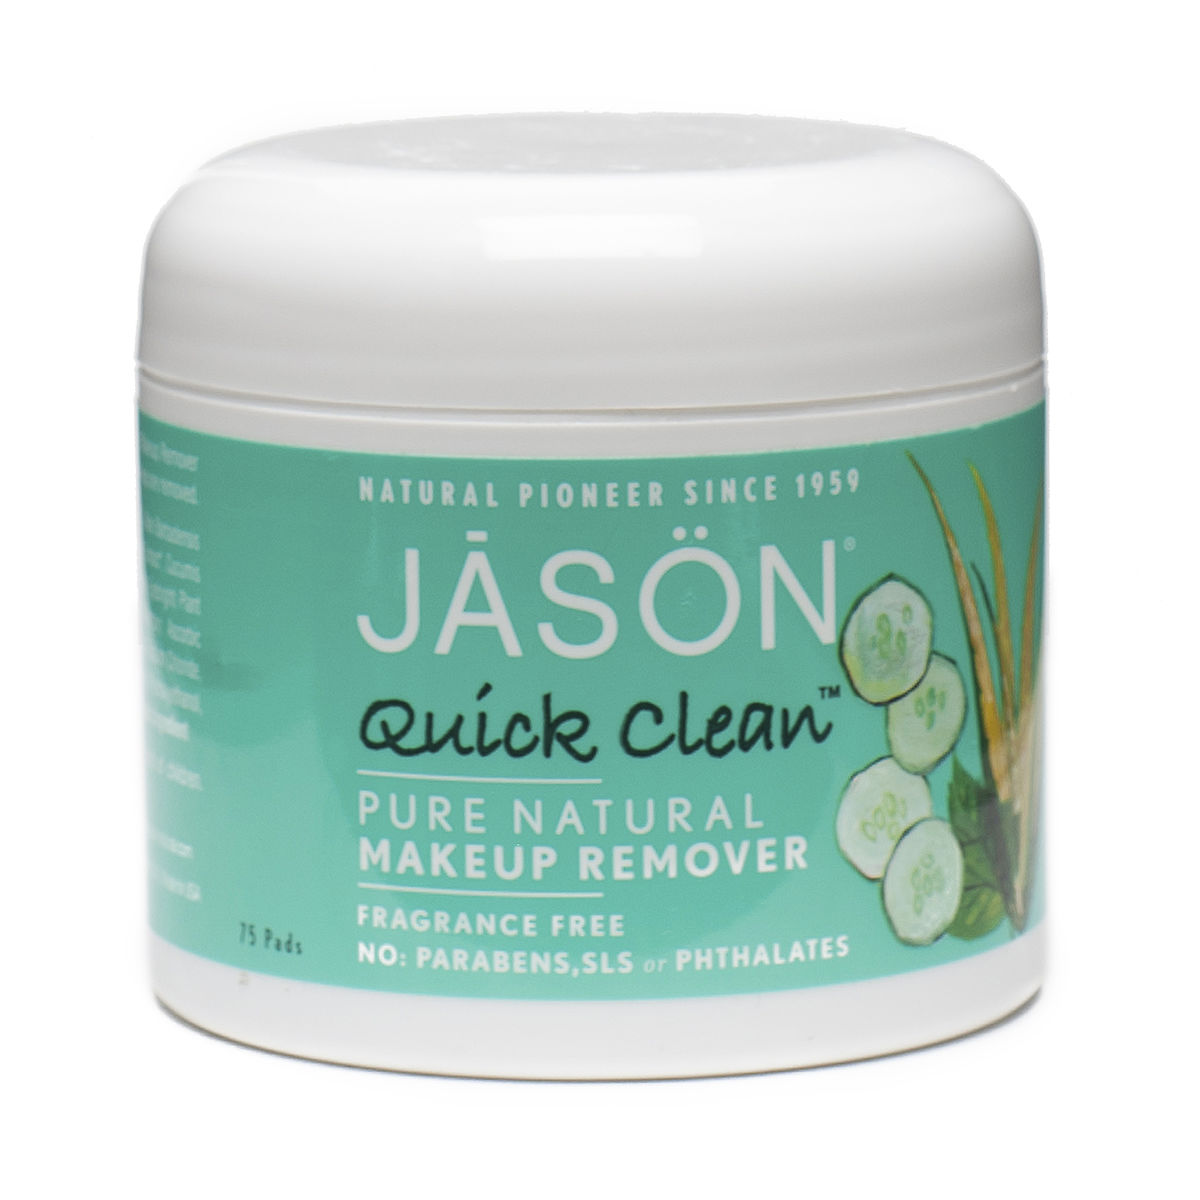 makeup  clean jar 2 clean pads  quick natural 75 jason quick pads remover jason pads per makeup leave natural remover